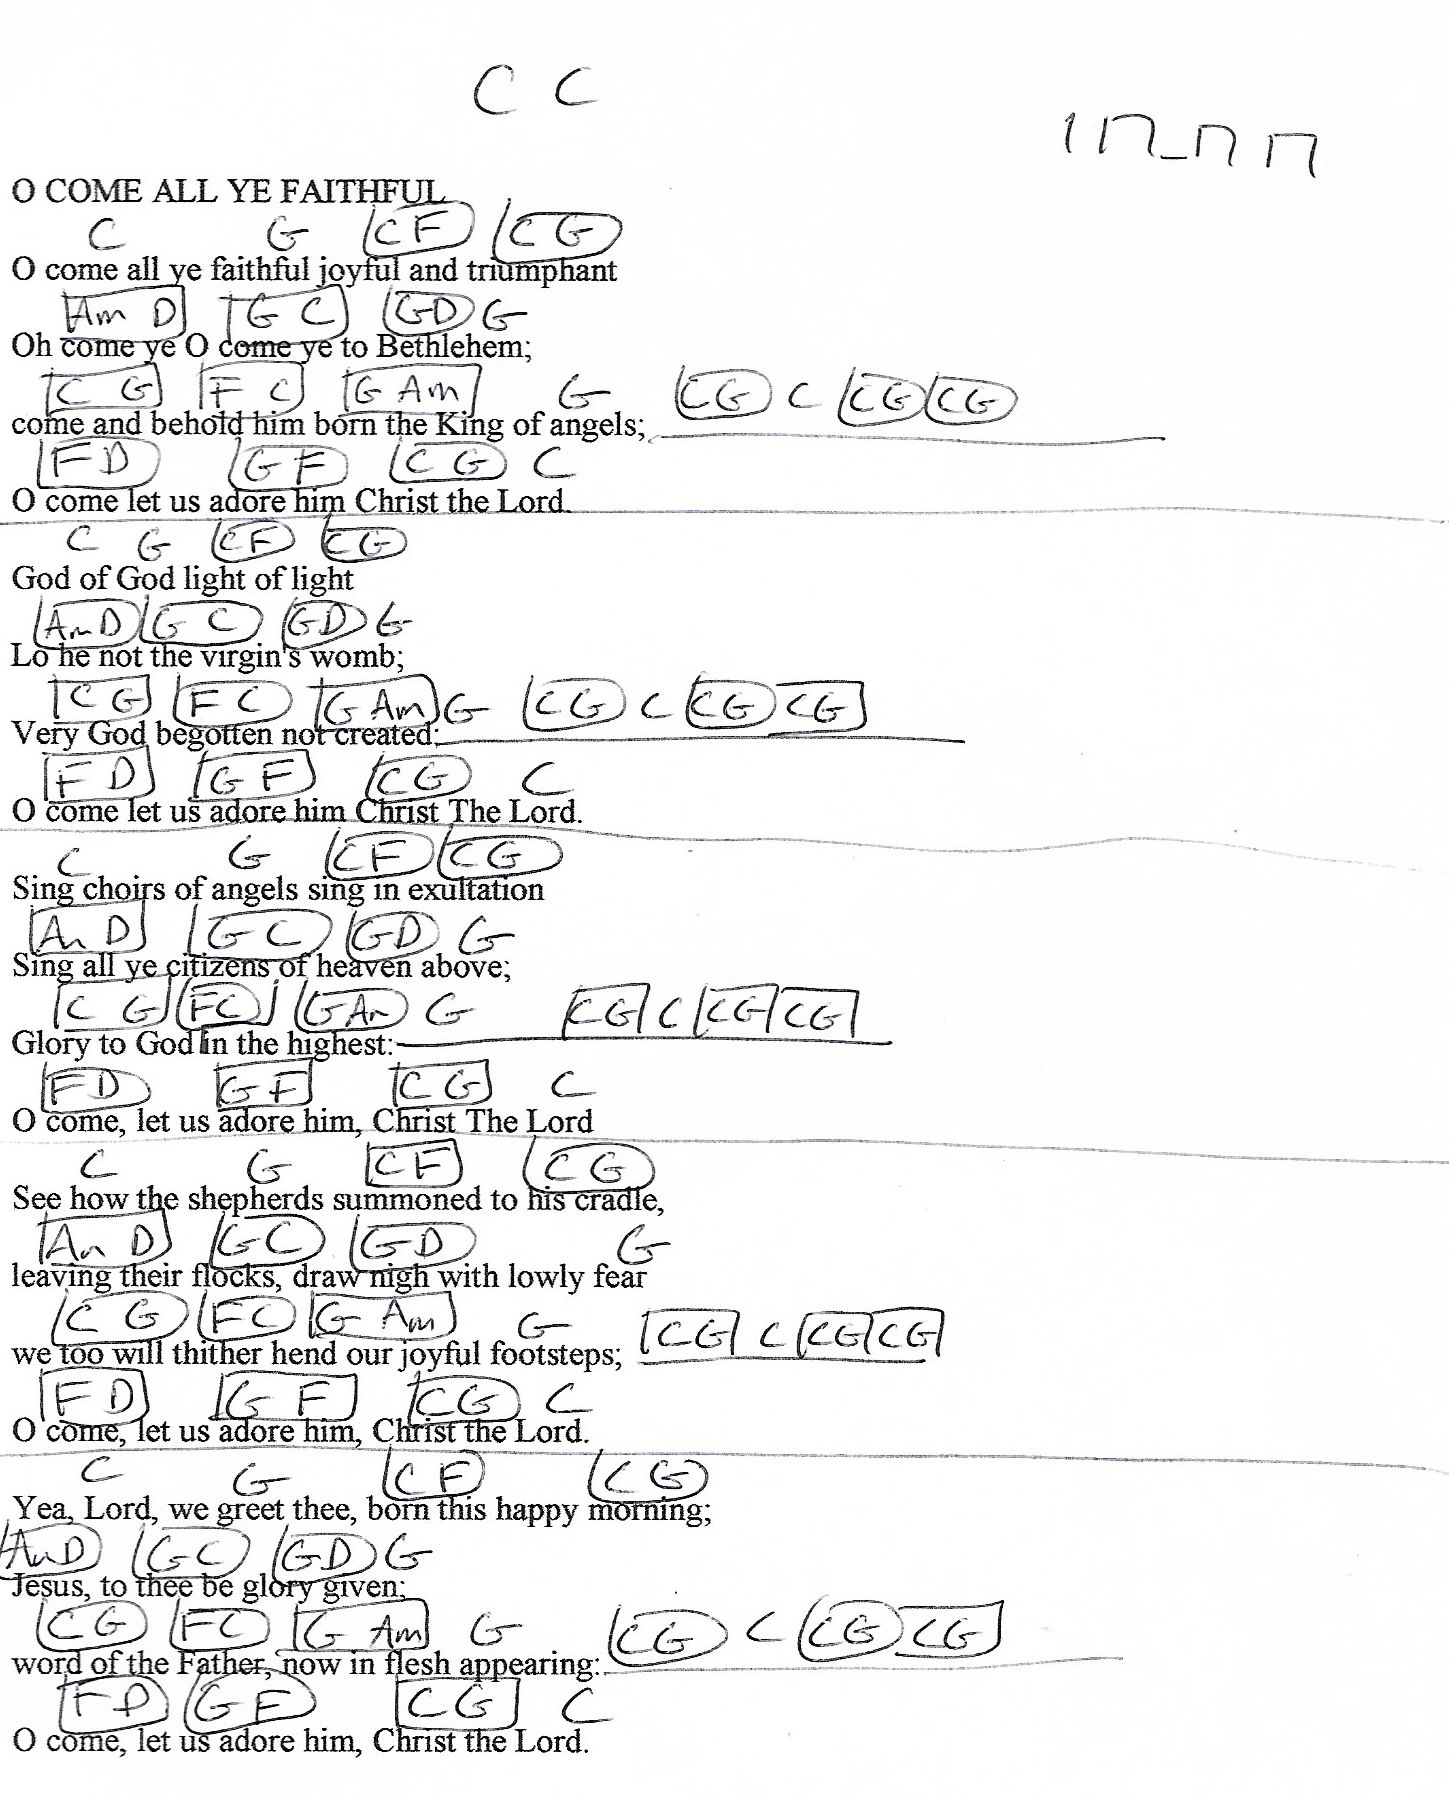 O Come All Ye Faithful (Christmas) C Major - Guitar Chord Chart with Lyrics - http://www.youtube ...